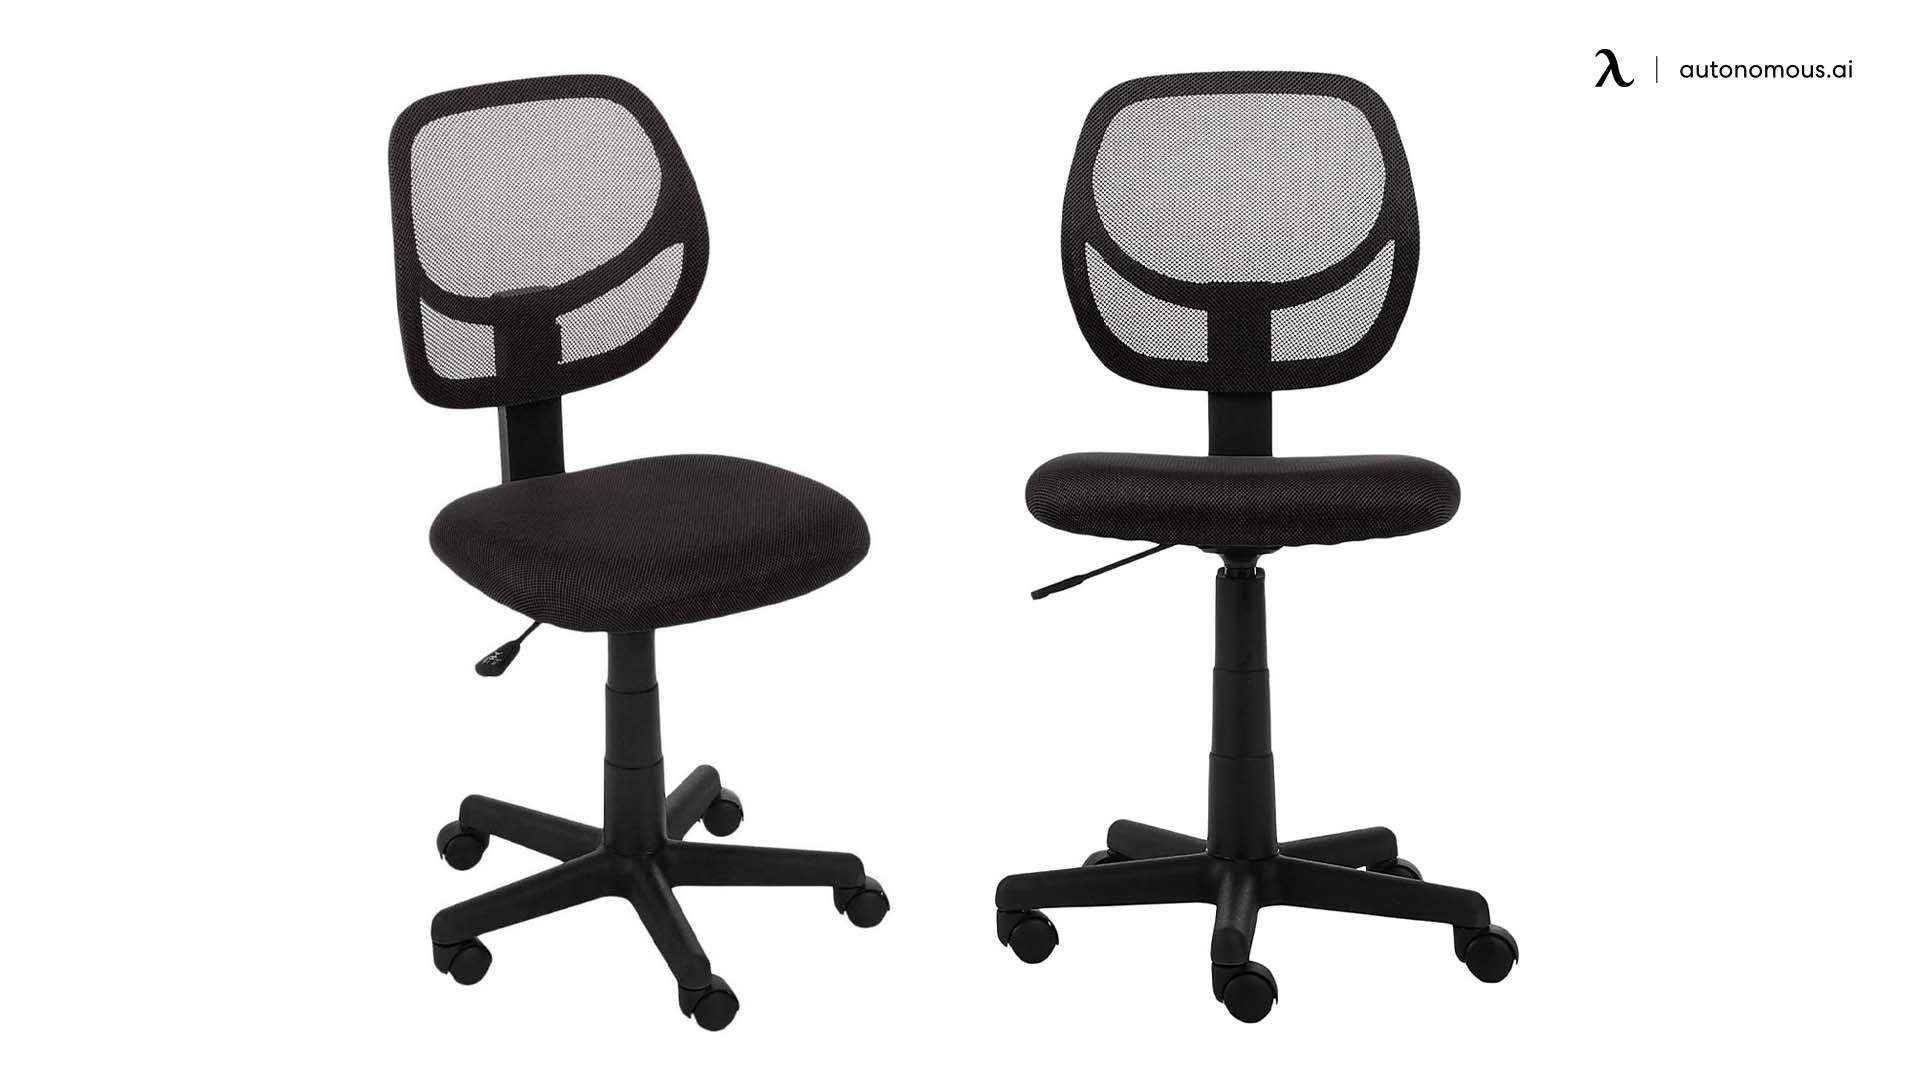 AmazonBasics Swivel Chair